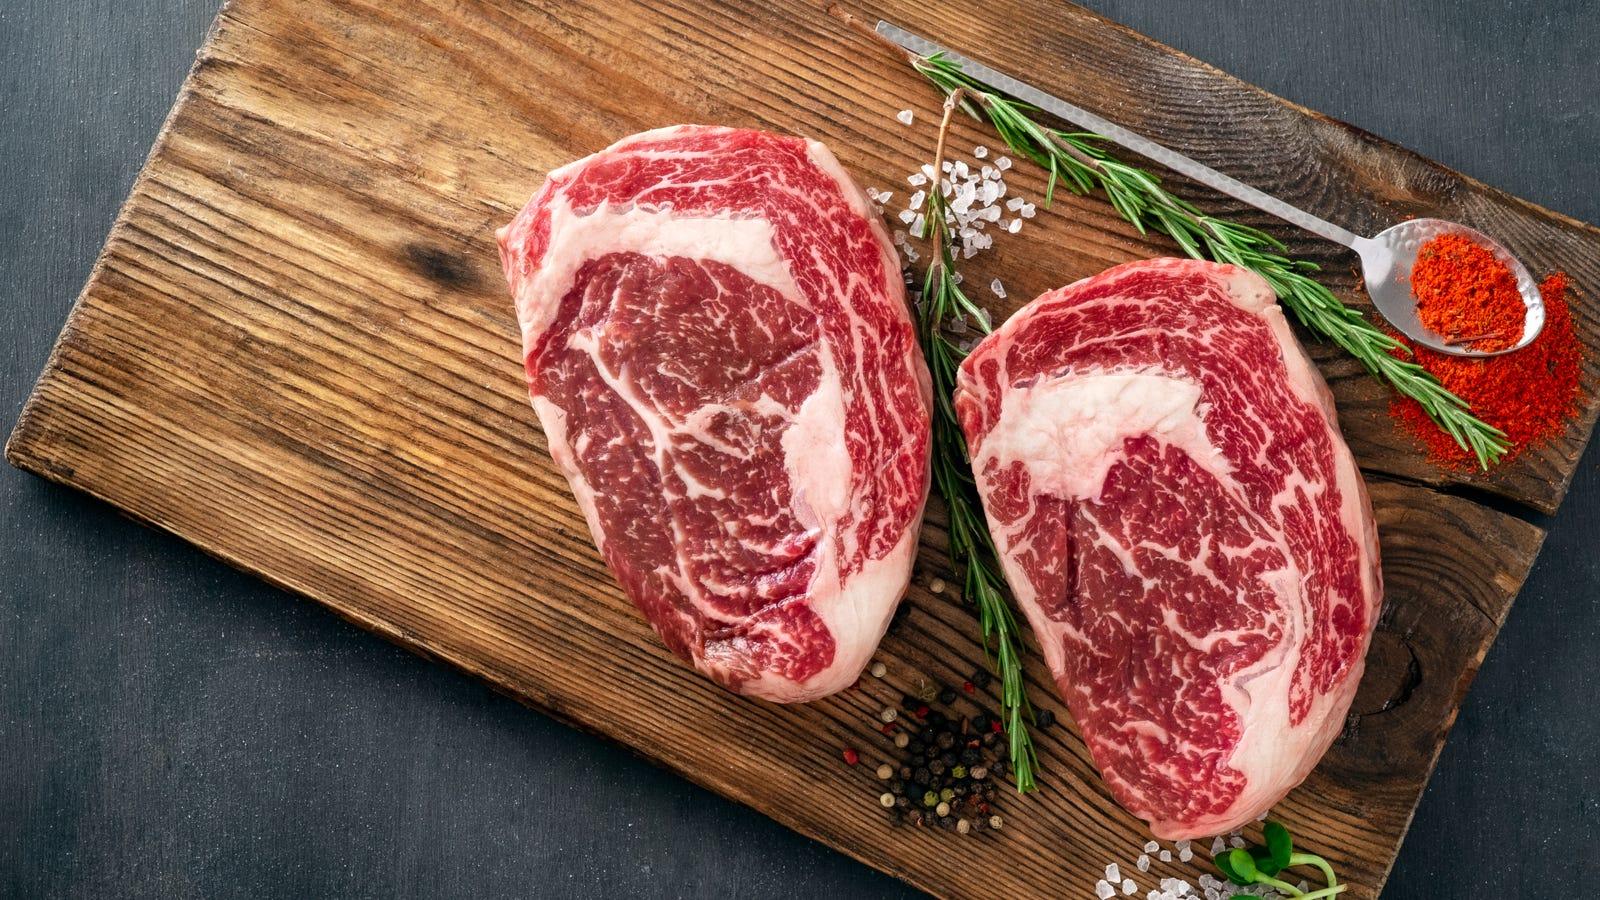 Two ribeye steaks displaying really nice marbling througout both cuts.